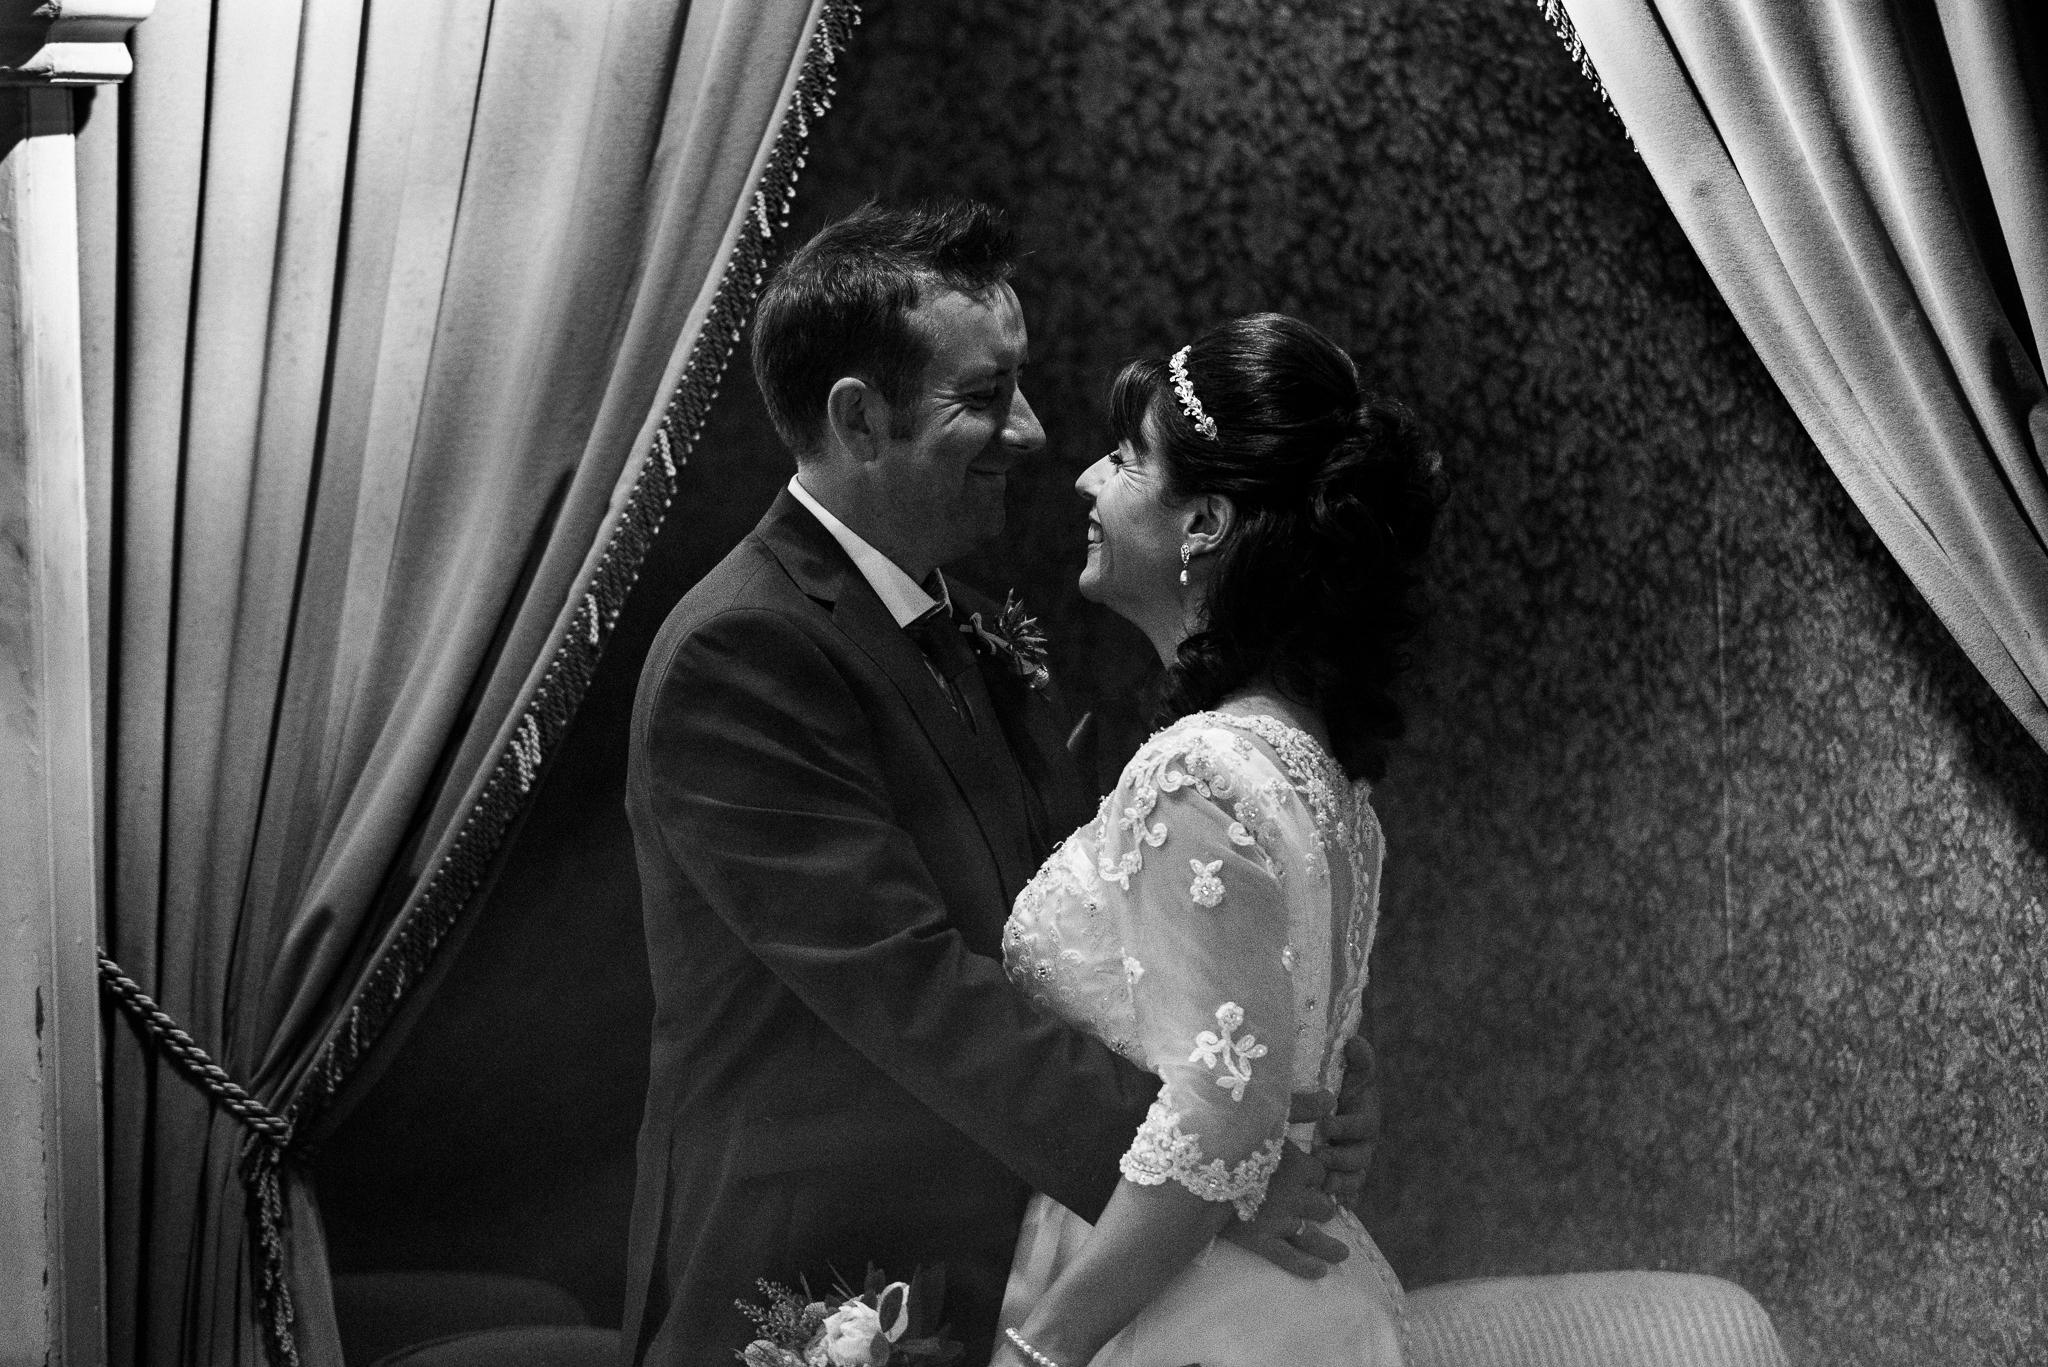 Cheshire Wedding Photography at Crewe Lyceum Theatre Stage Wedding Art Deco 20s - Jenny Harper-33.jpg